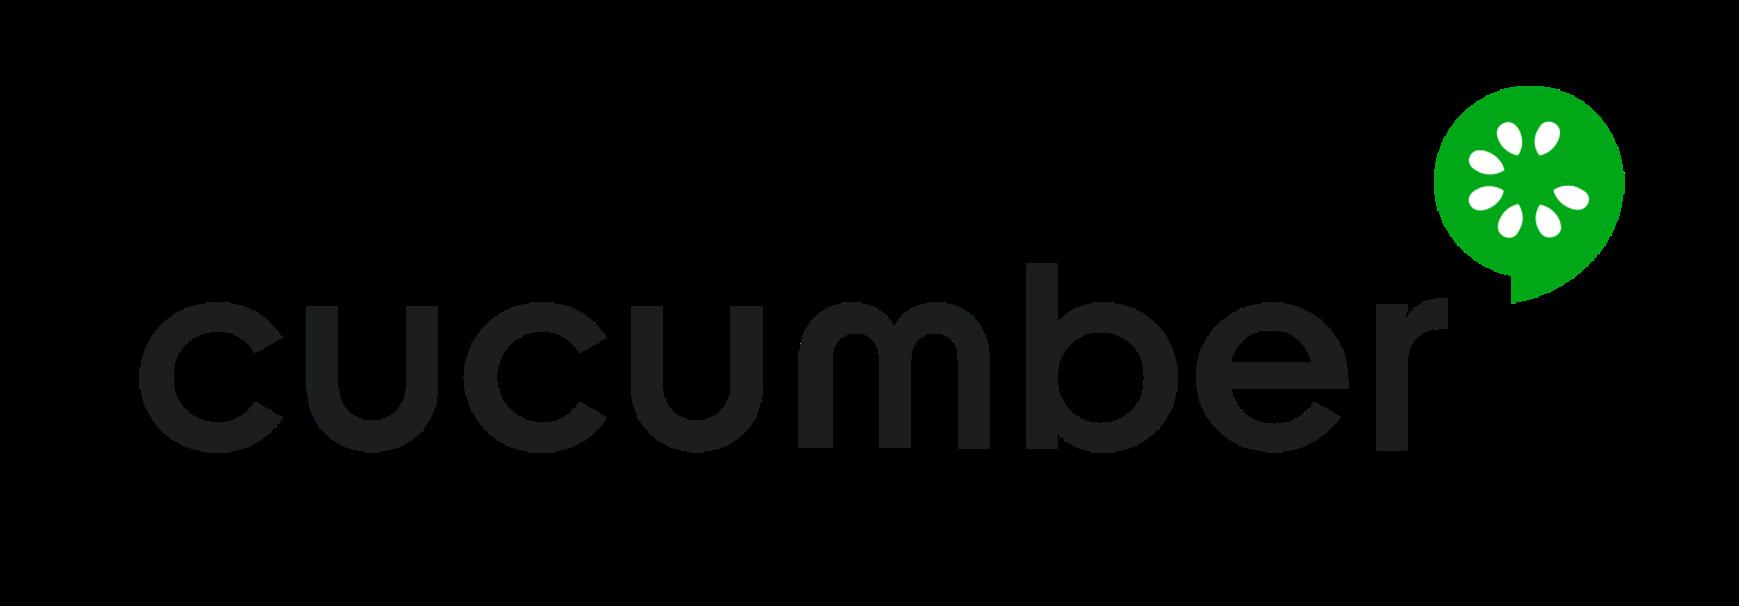 Cucumber logo - Cucumber Selenium Tutorial - Edureka